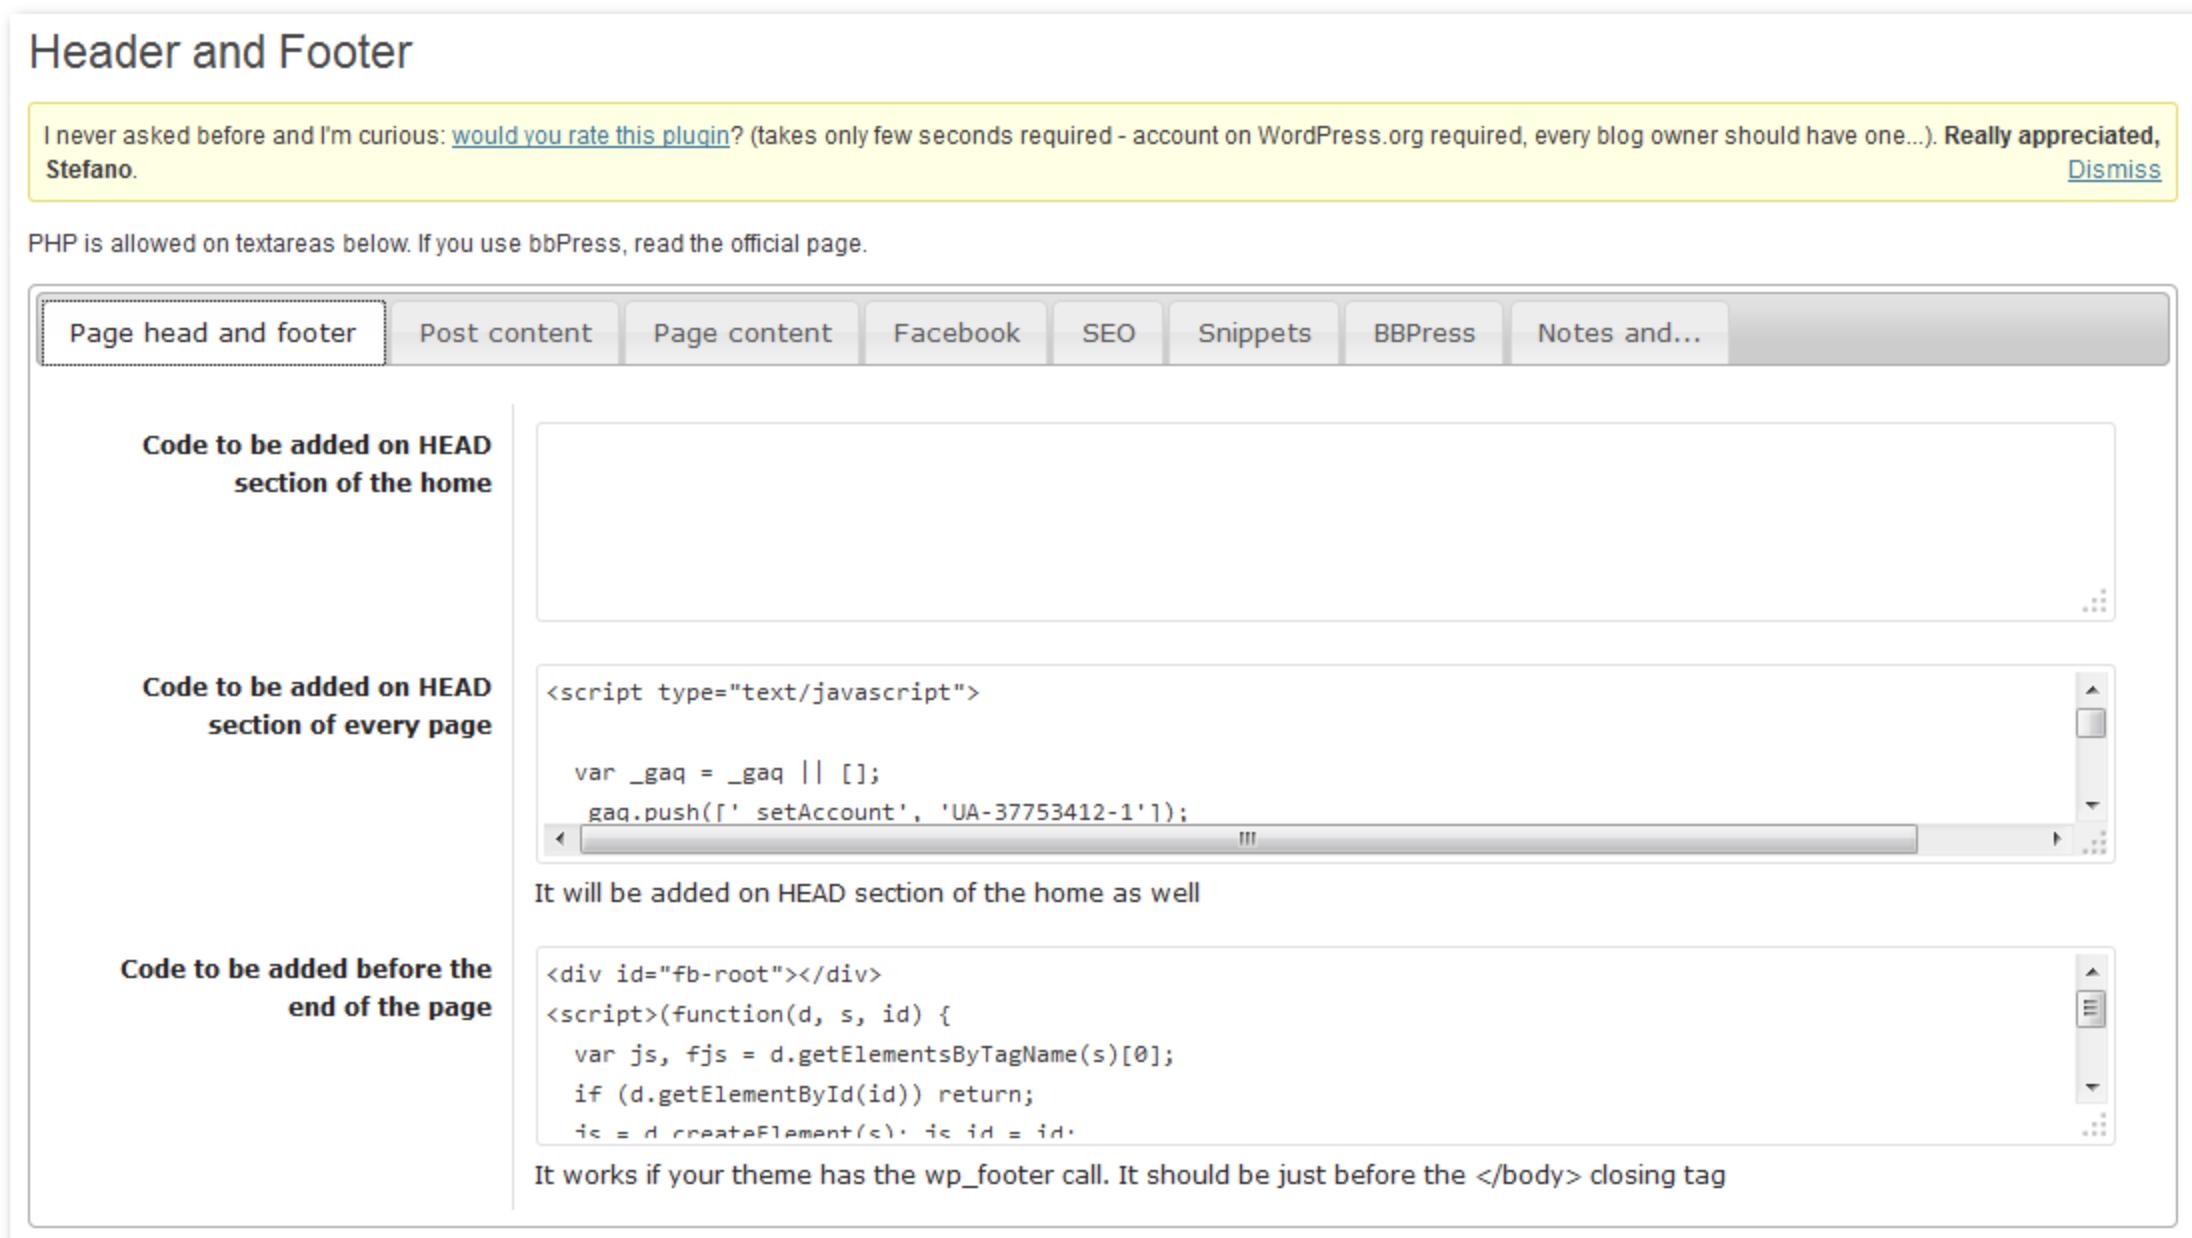 Testata-Inferiore-post-iniezioni-wordpress-plugins